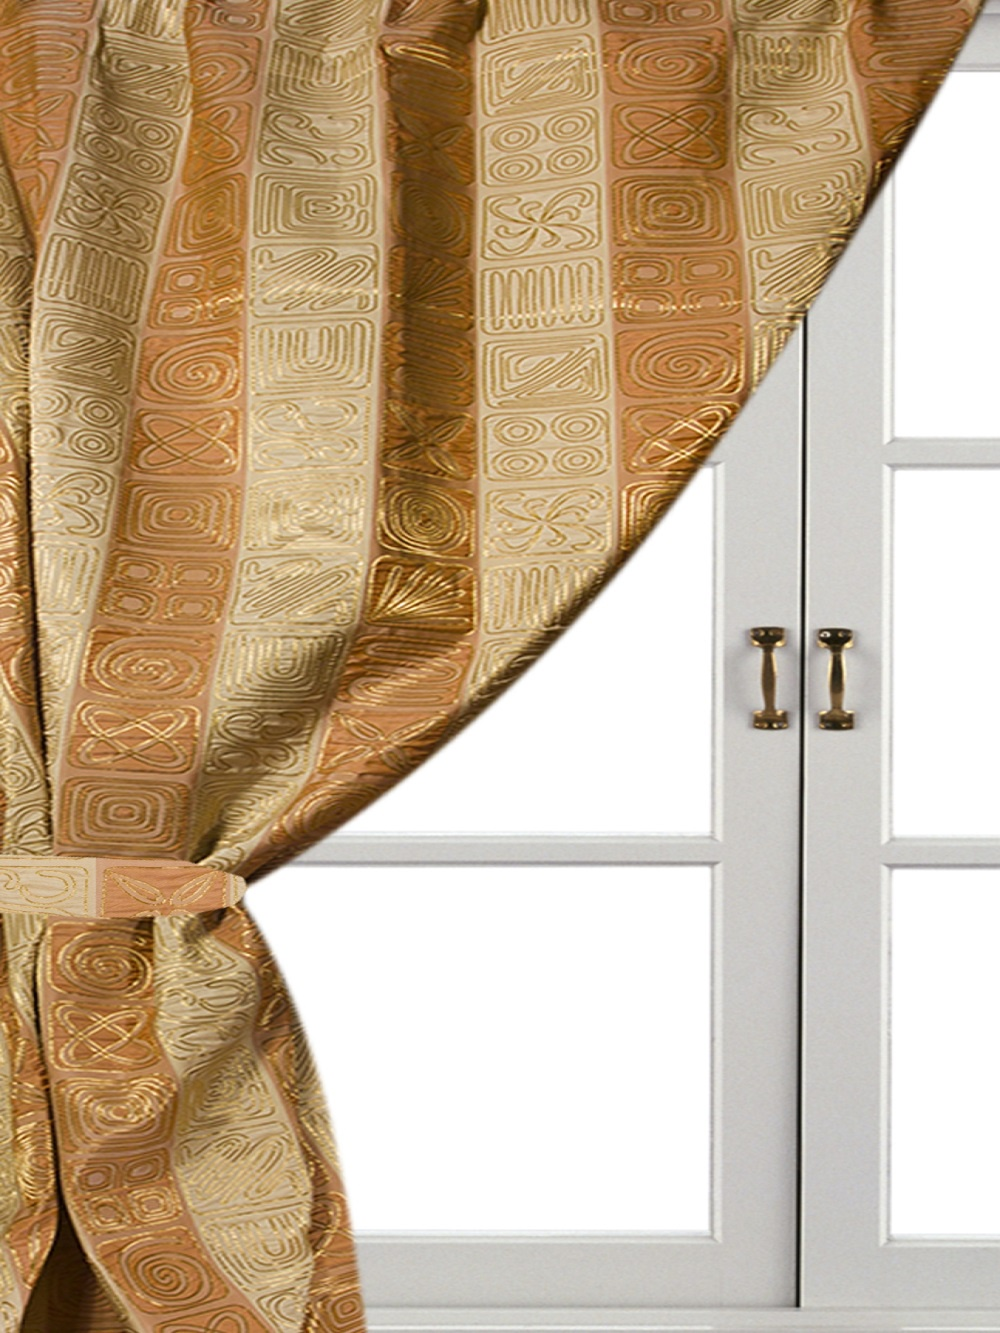 Шторы комнатные Айлант ОБ13 шторы homedeco нитяные шторы яркие кольца